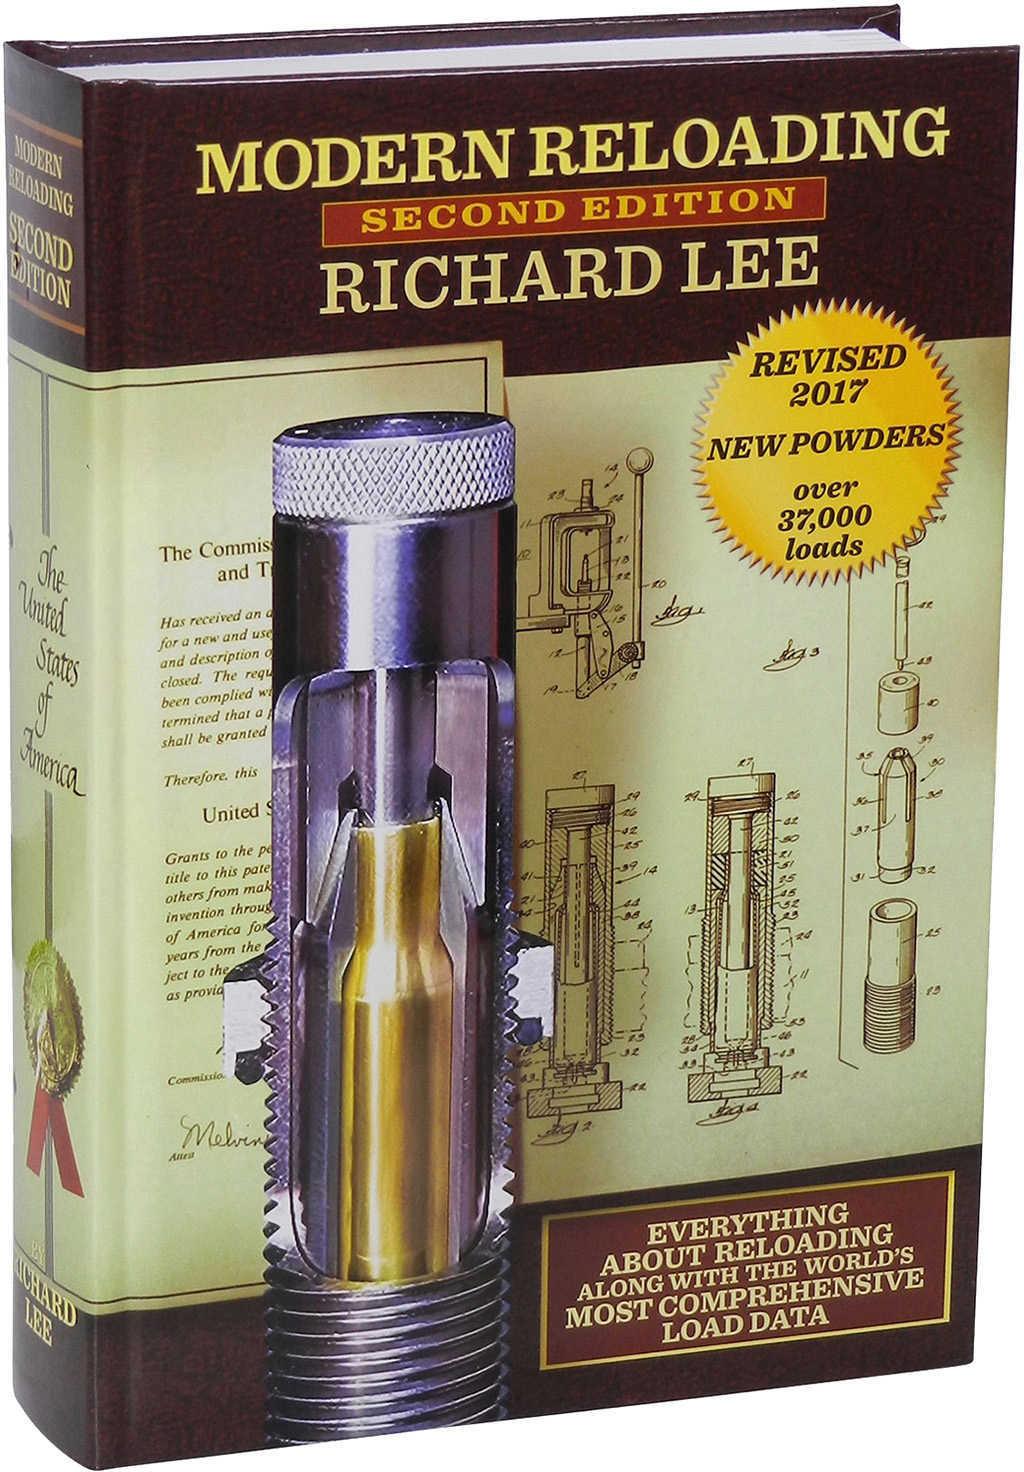 Lee's Reloading Modern Reloading 2nd Edition, Revised Reloading Manual